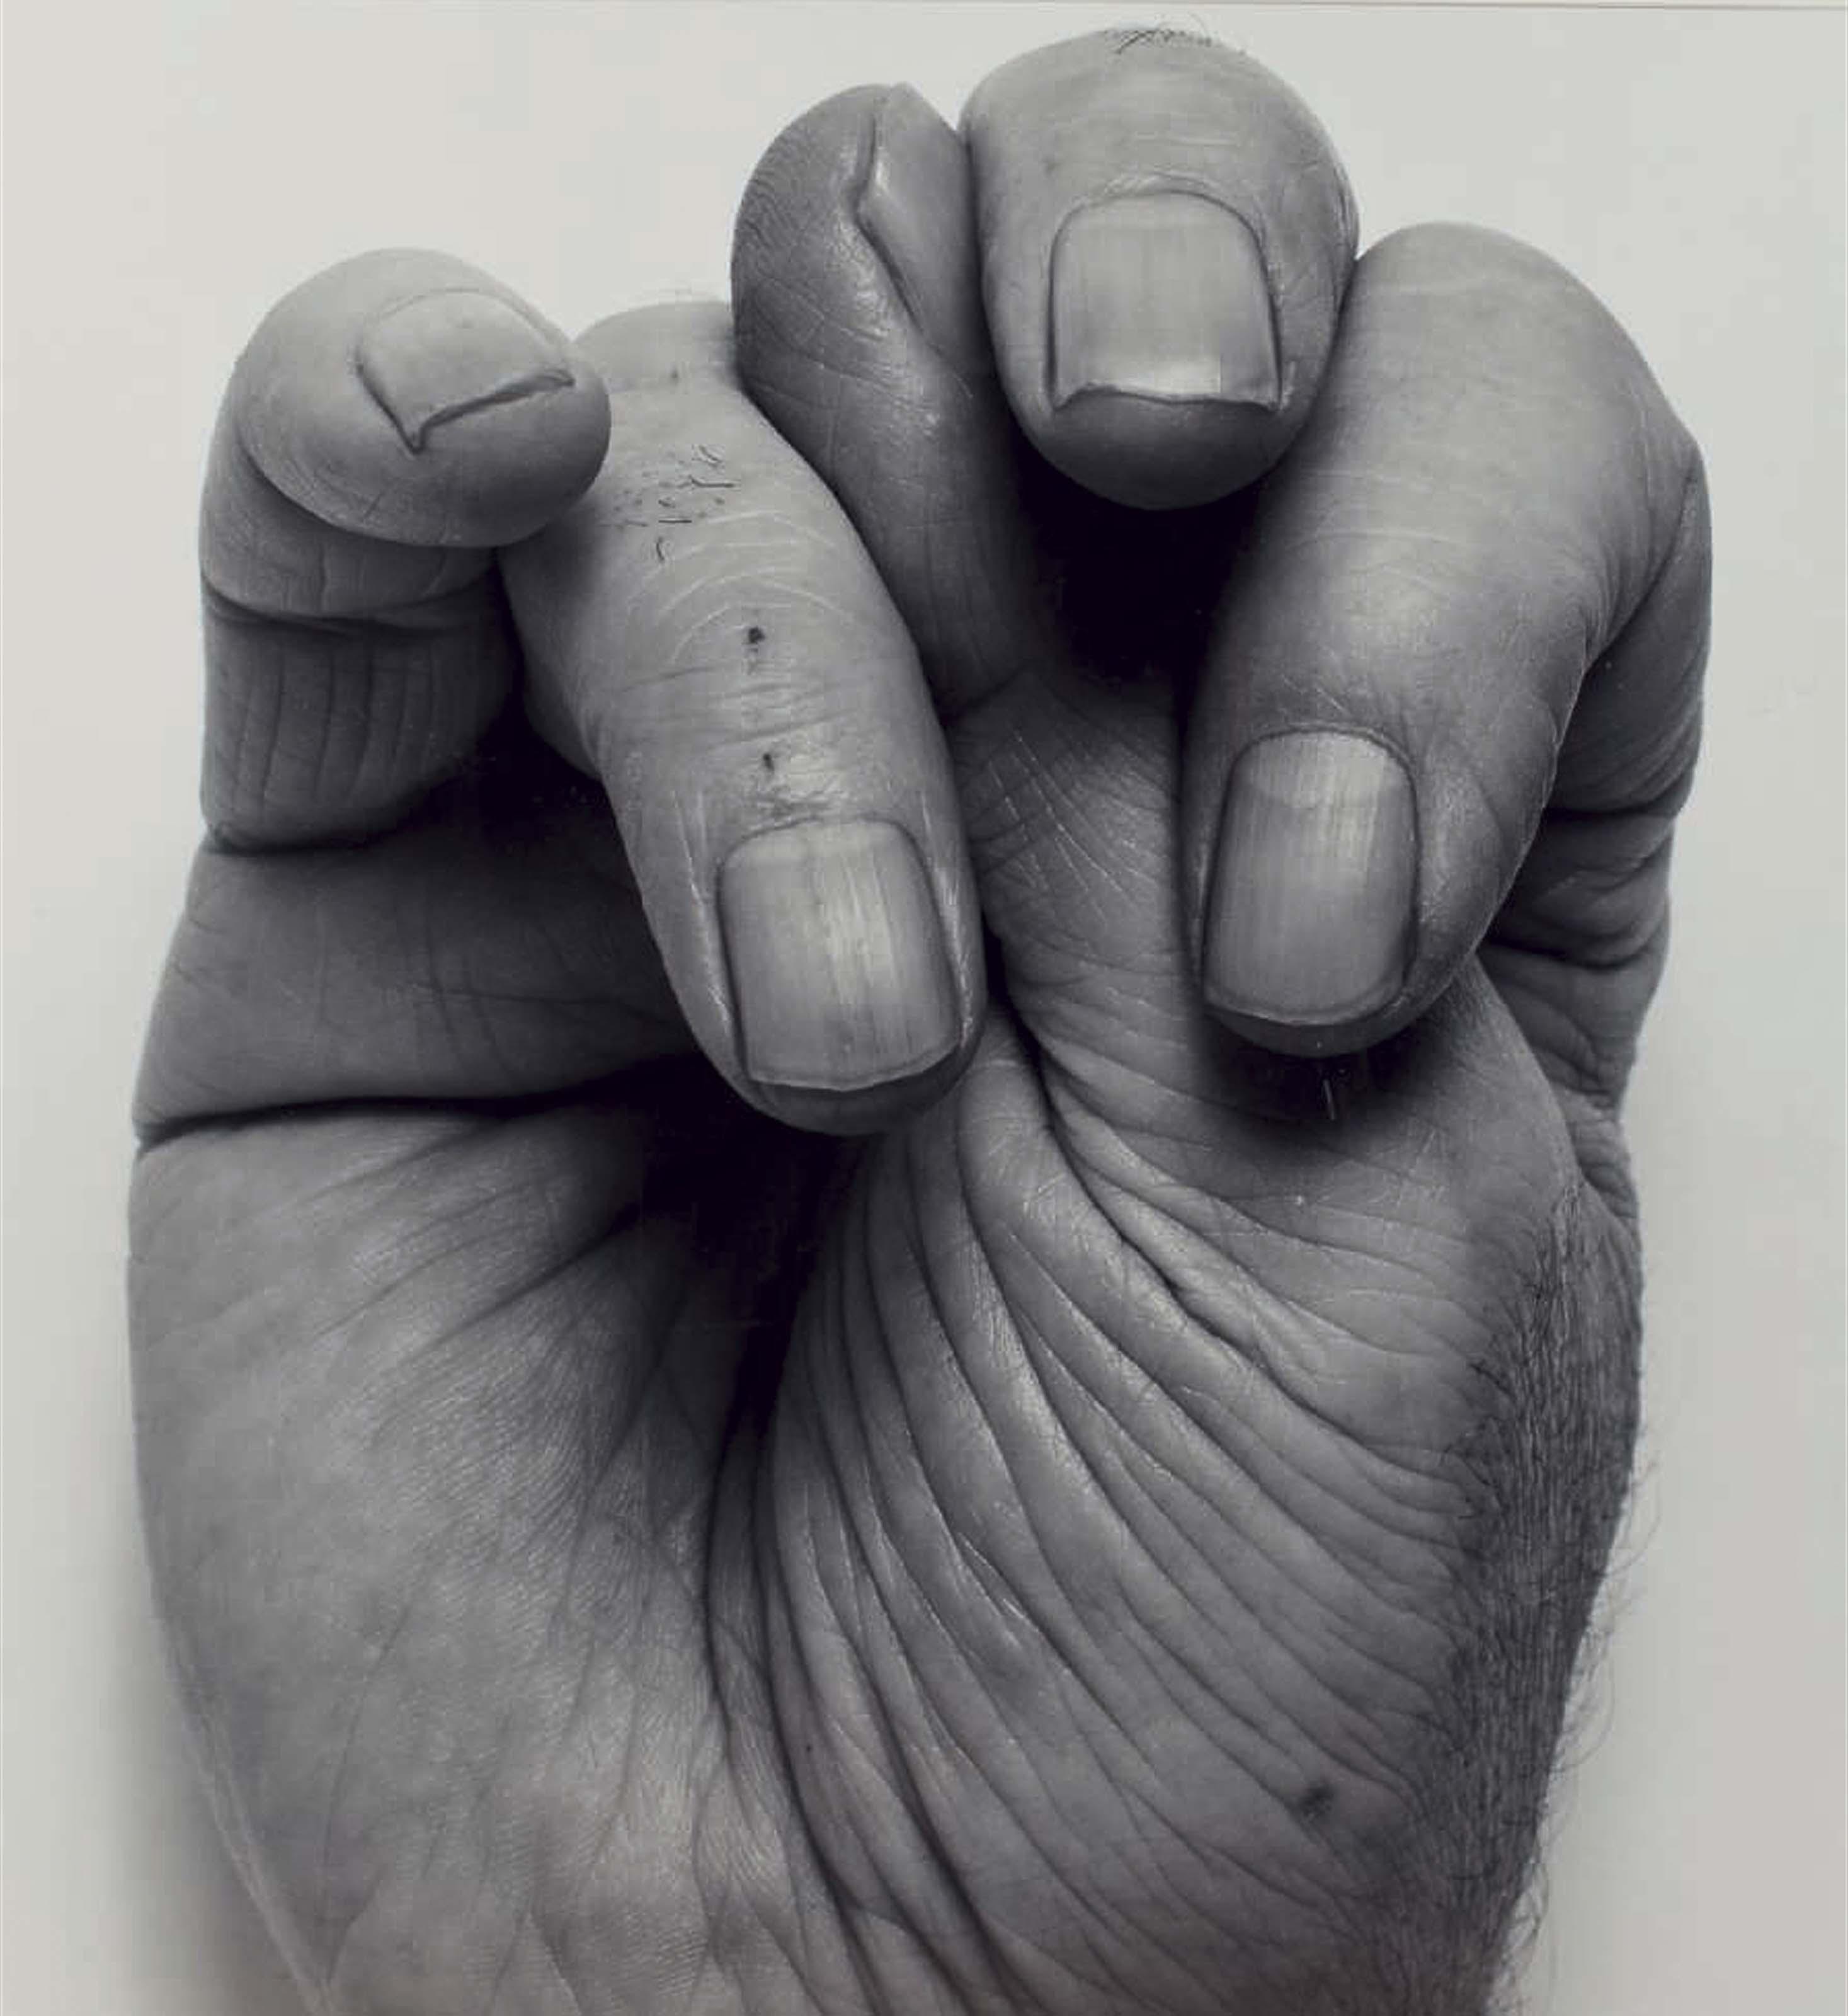 Self-portrait SP5-88, 1988